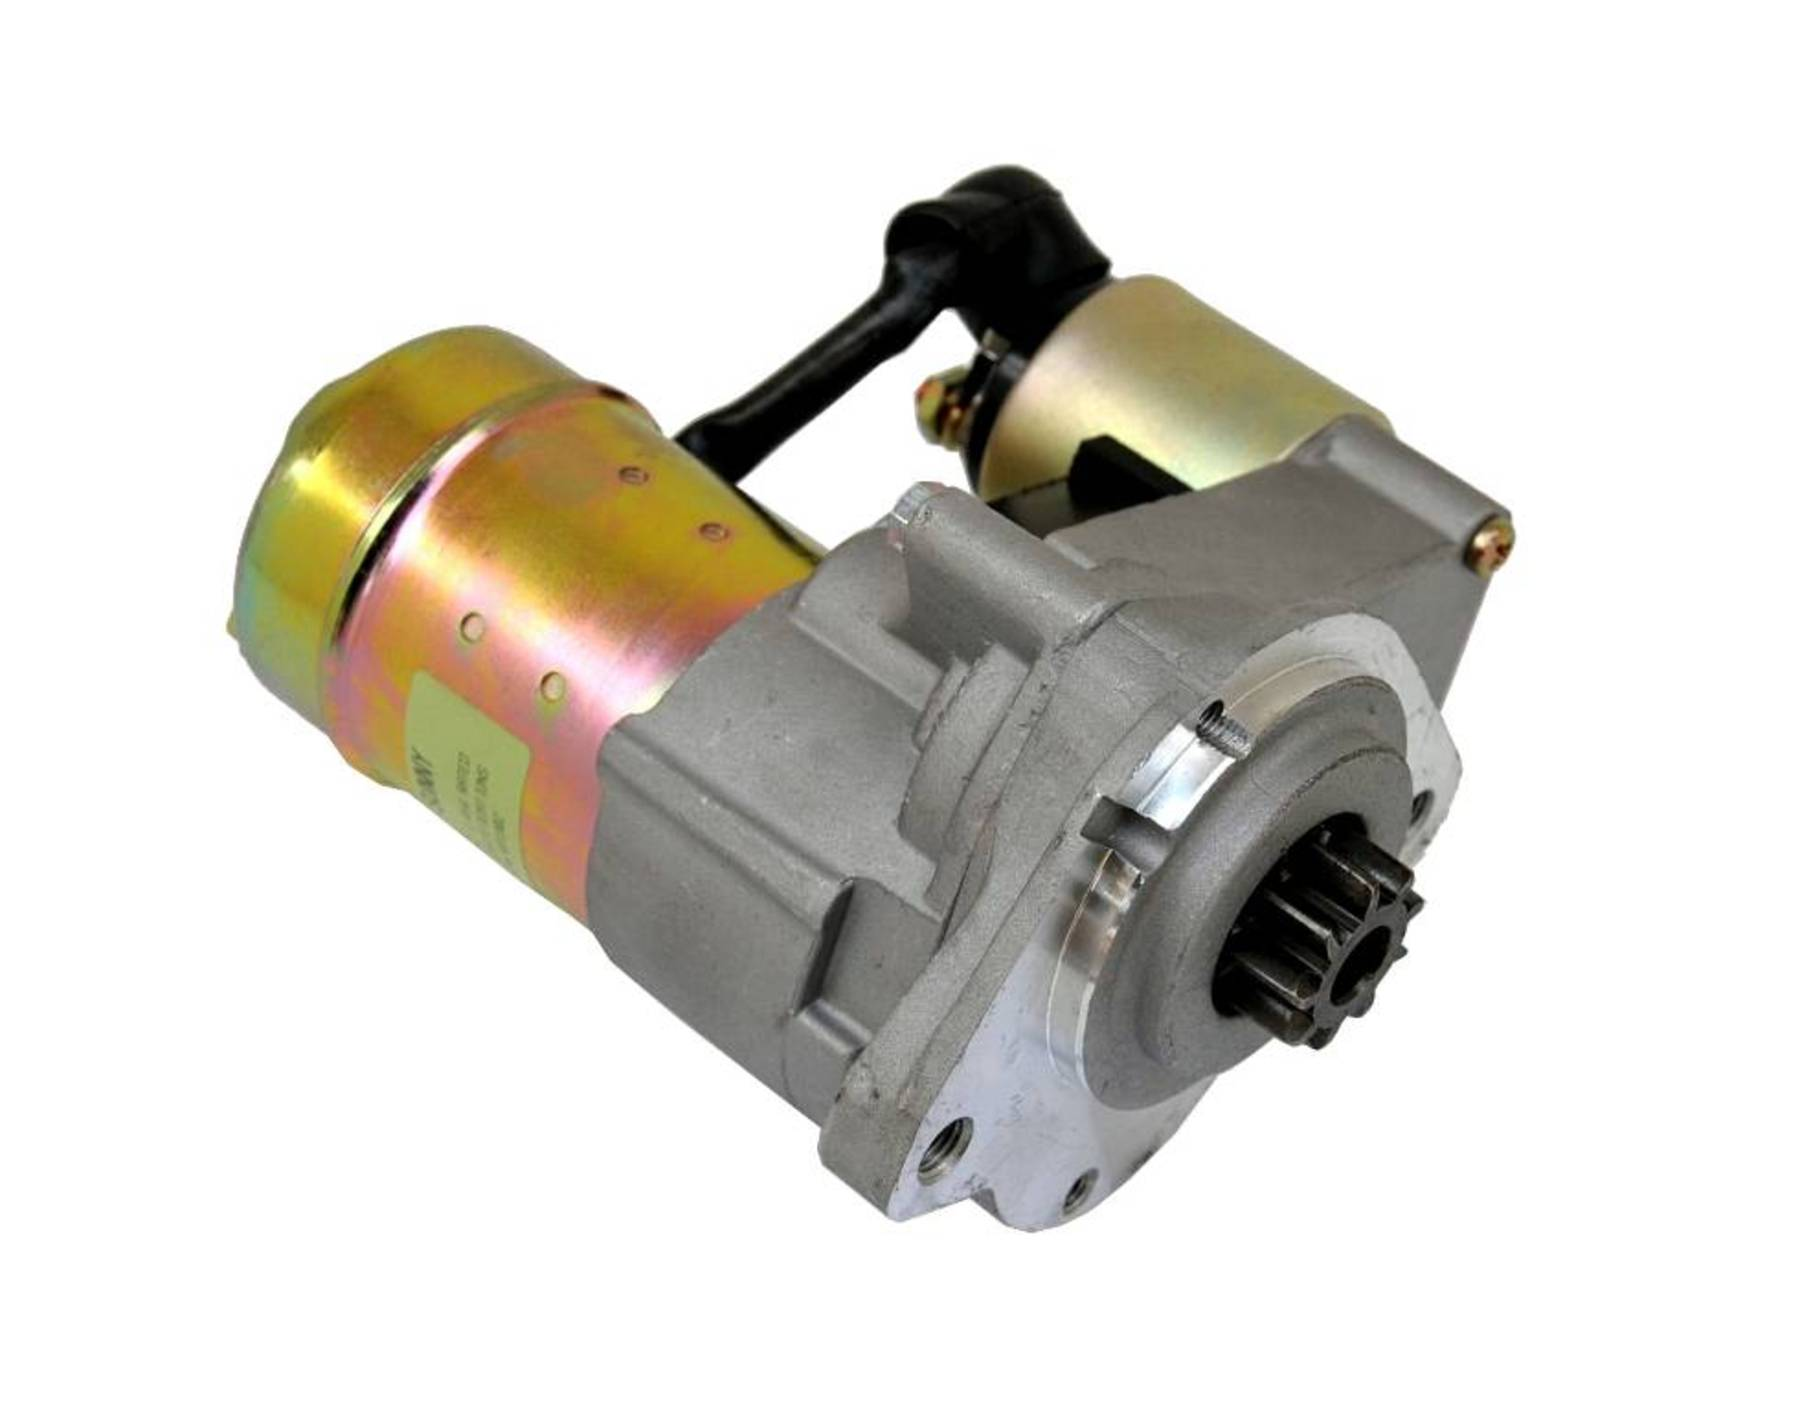 Diesel Generators Silent Generator Kipor Parts Uk Ats Wiring Diagram Ks0116 Starter Motor Kde12sta